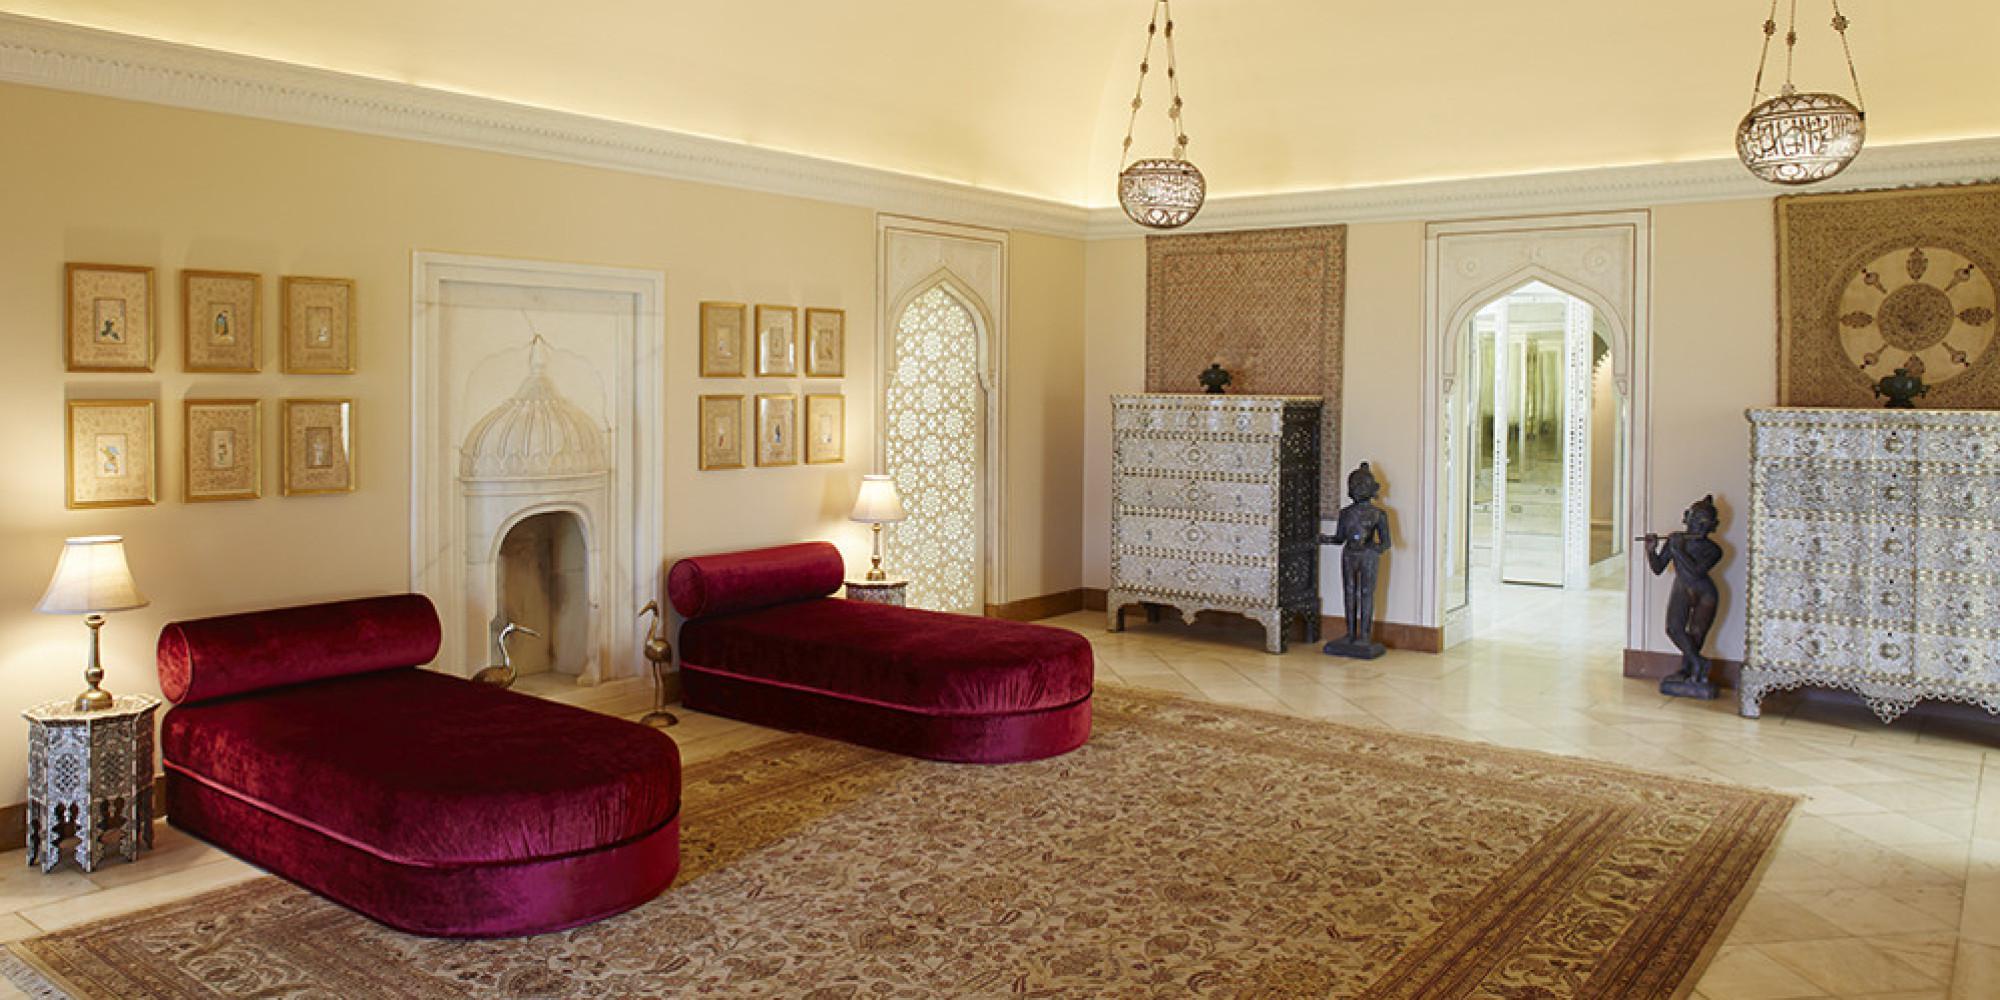 This Billionaire's Bedroom Is A Treasure Trove Of Islamic Art